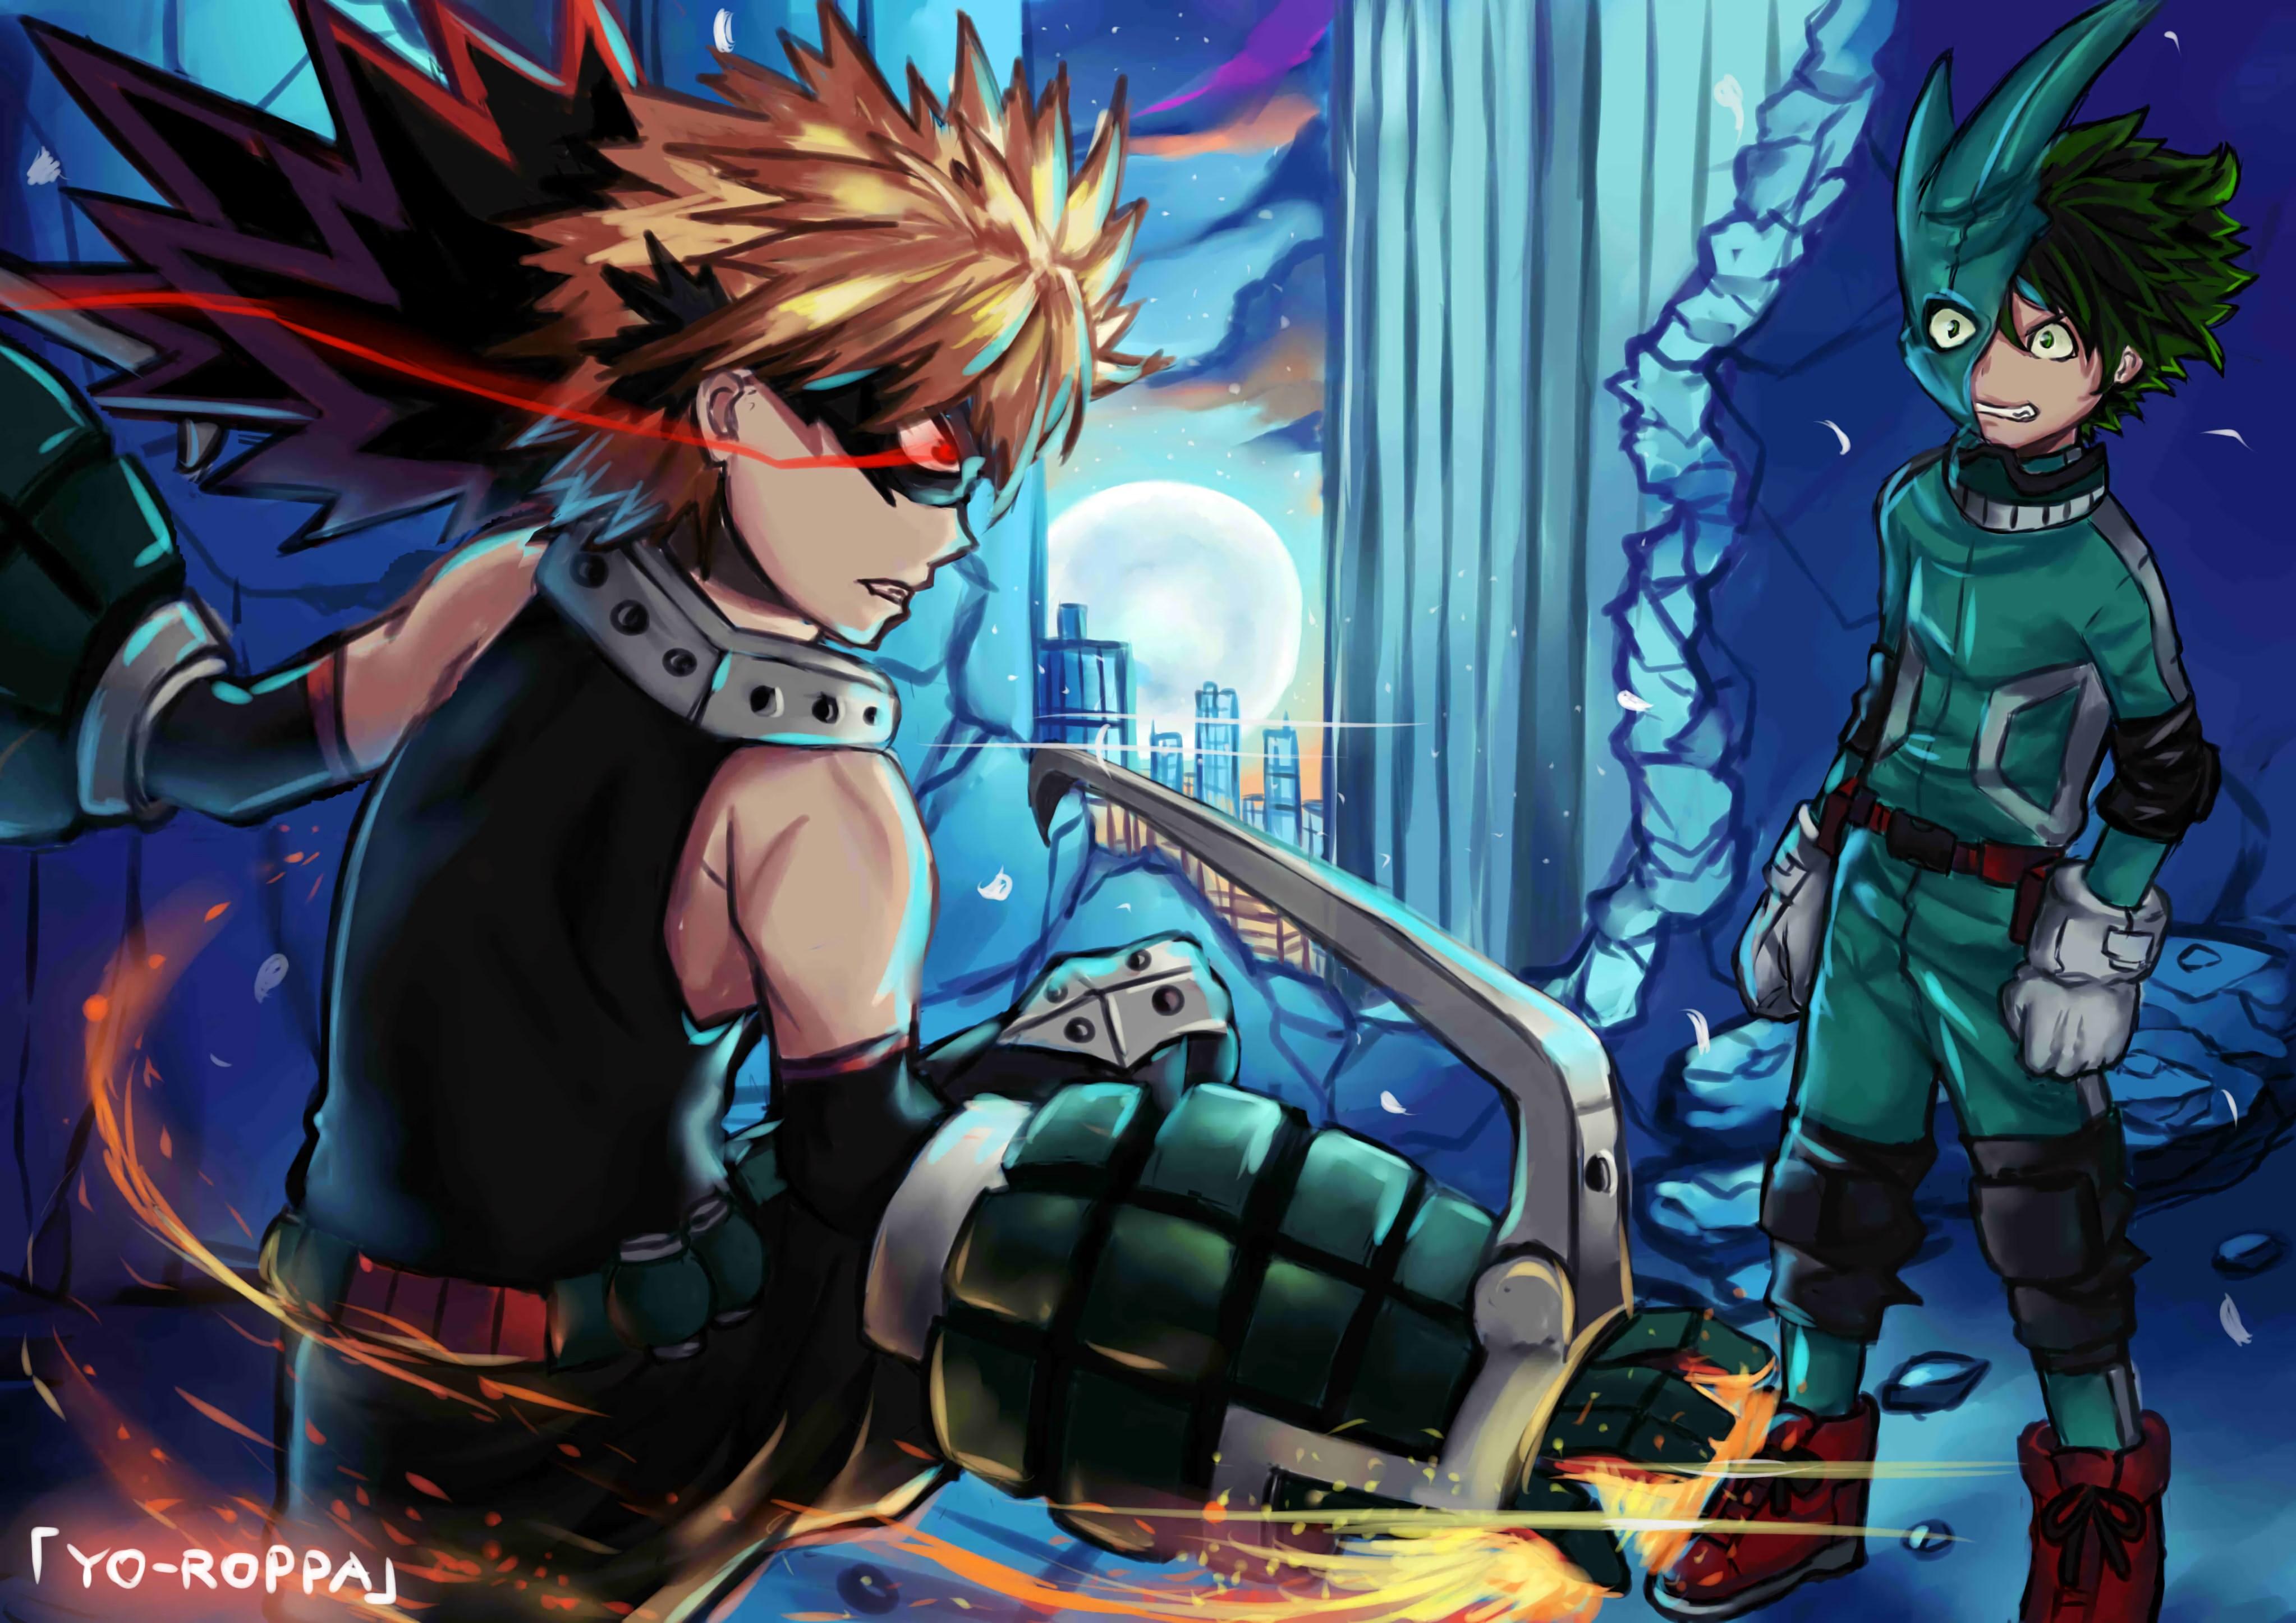 Boku No Hero Academia 4k Ultra Hd Wallpaper My Hero